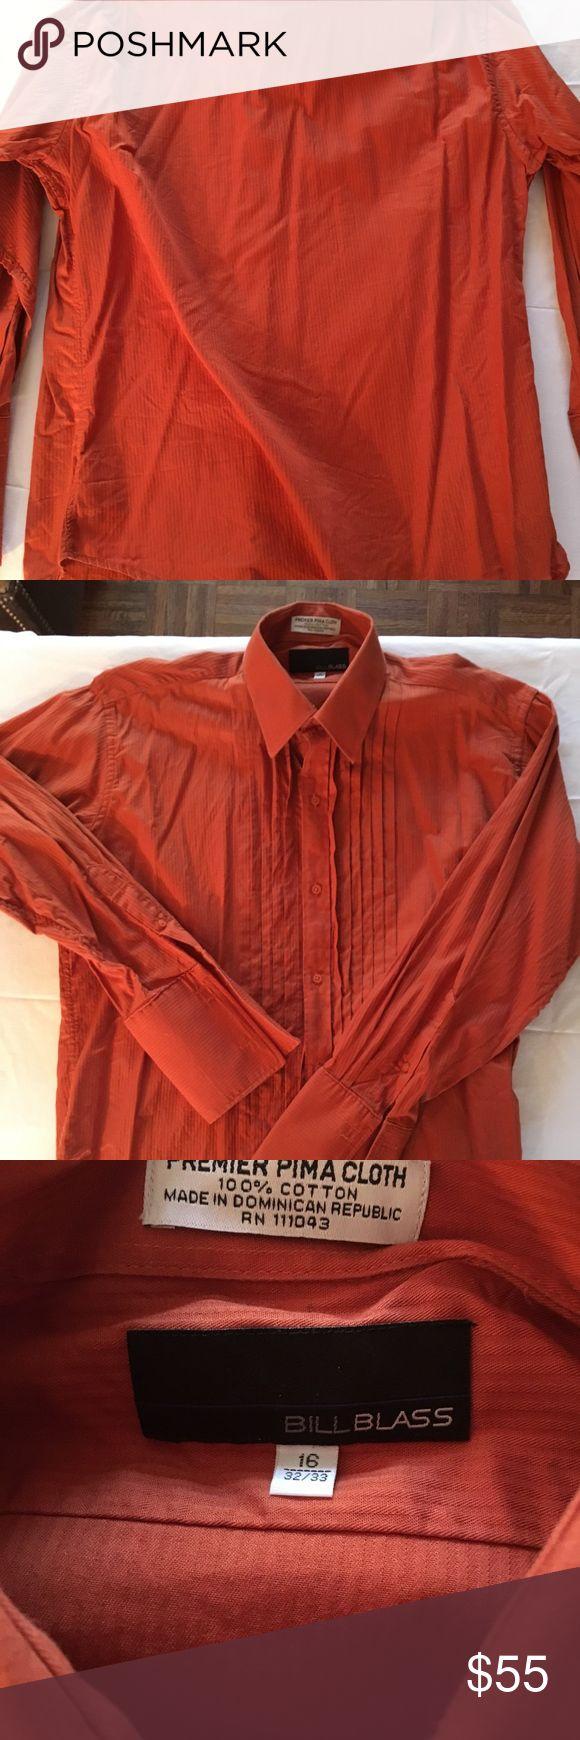 Vintage Bill Blass ruffle tux shirt Great condition. 16 32/33 100% cotton Bill Blass Shirts Dress Shirts